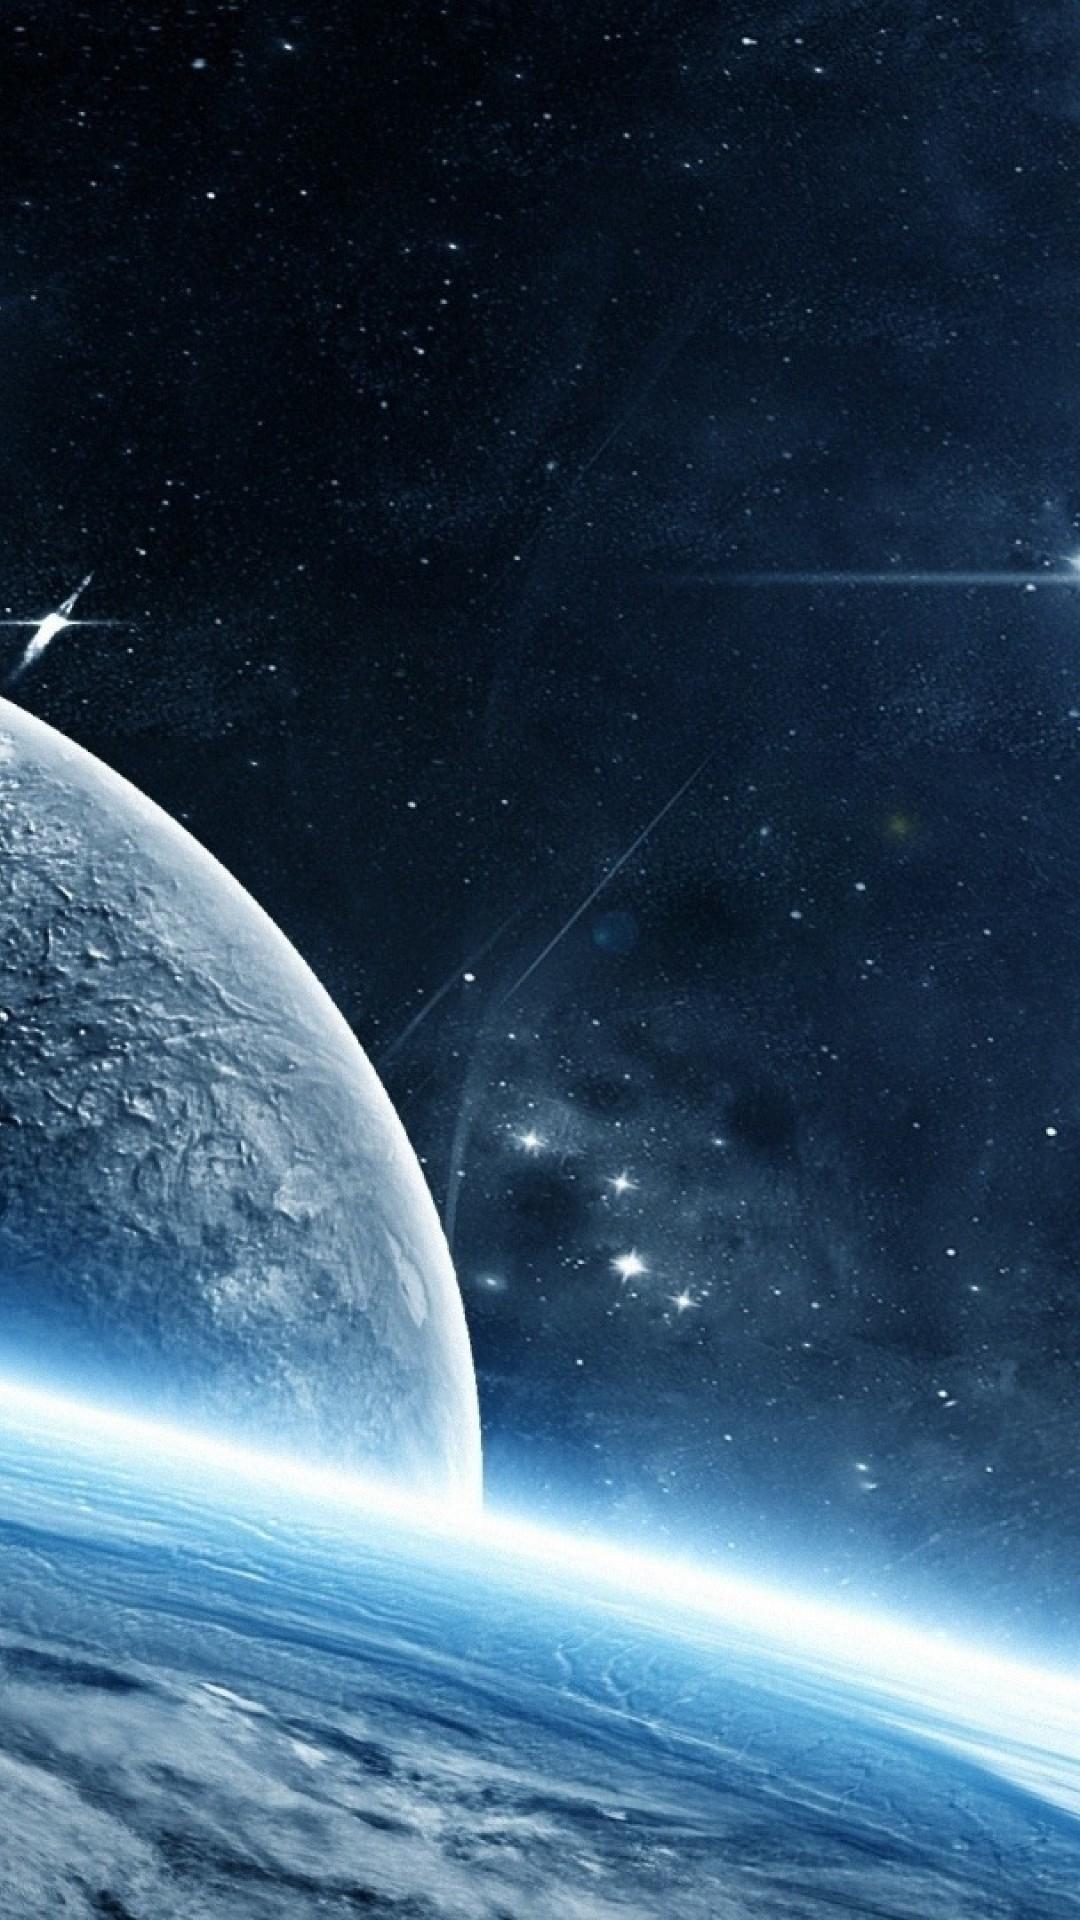 Lightsaber Iphone Wallpaper Wallpaper Planet Galaxy Stars 4k Space 16848